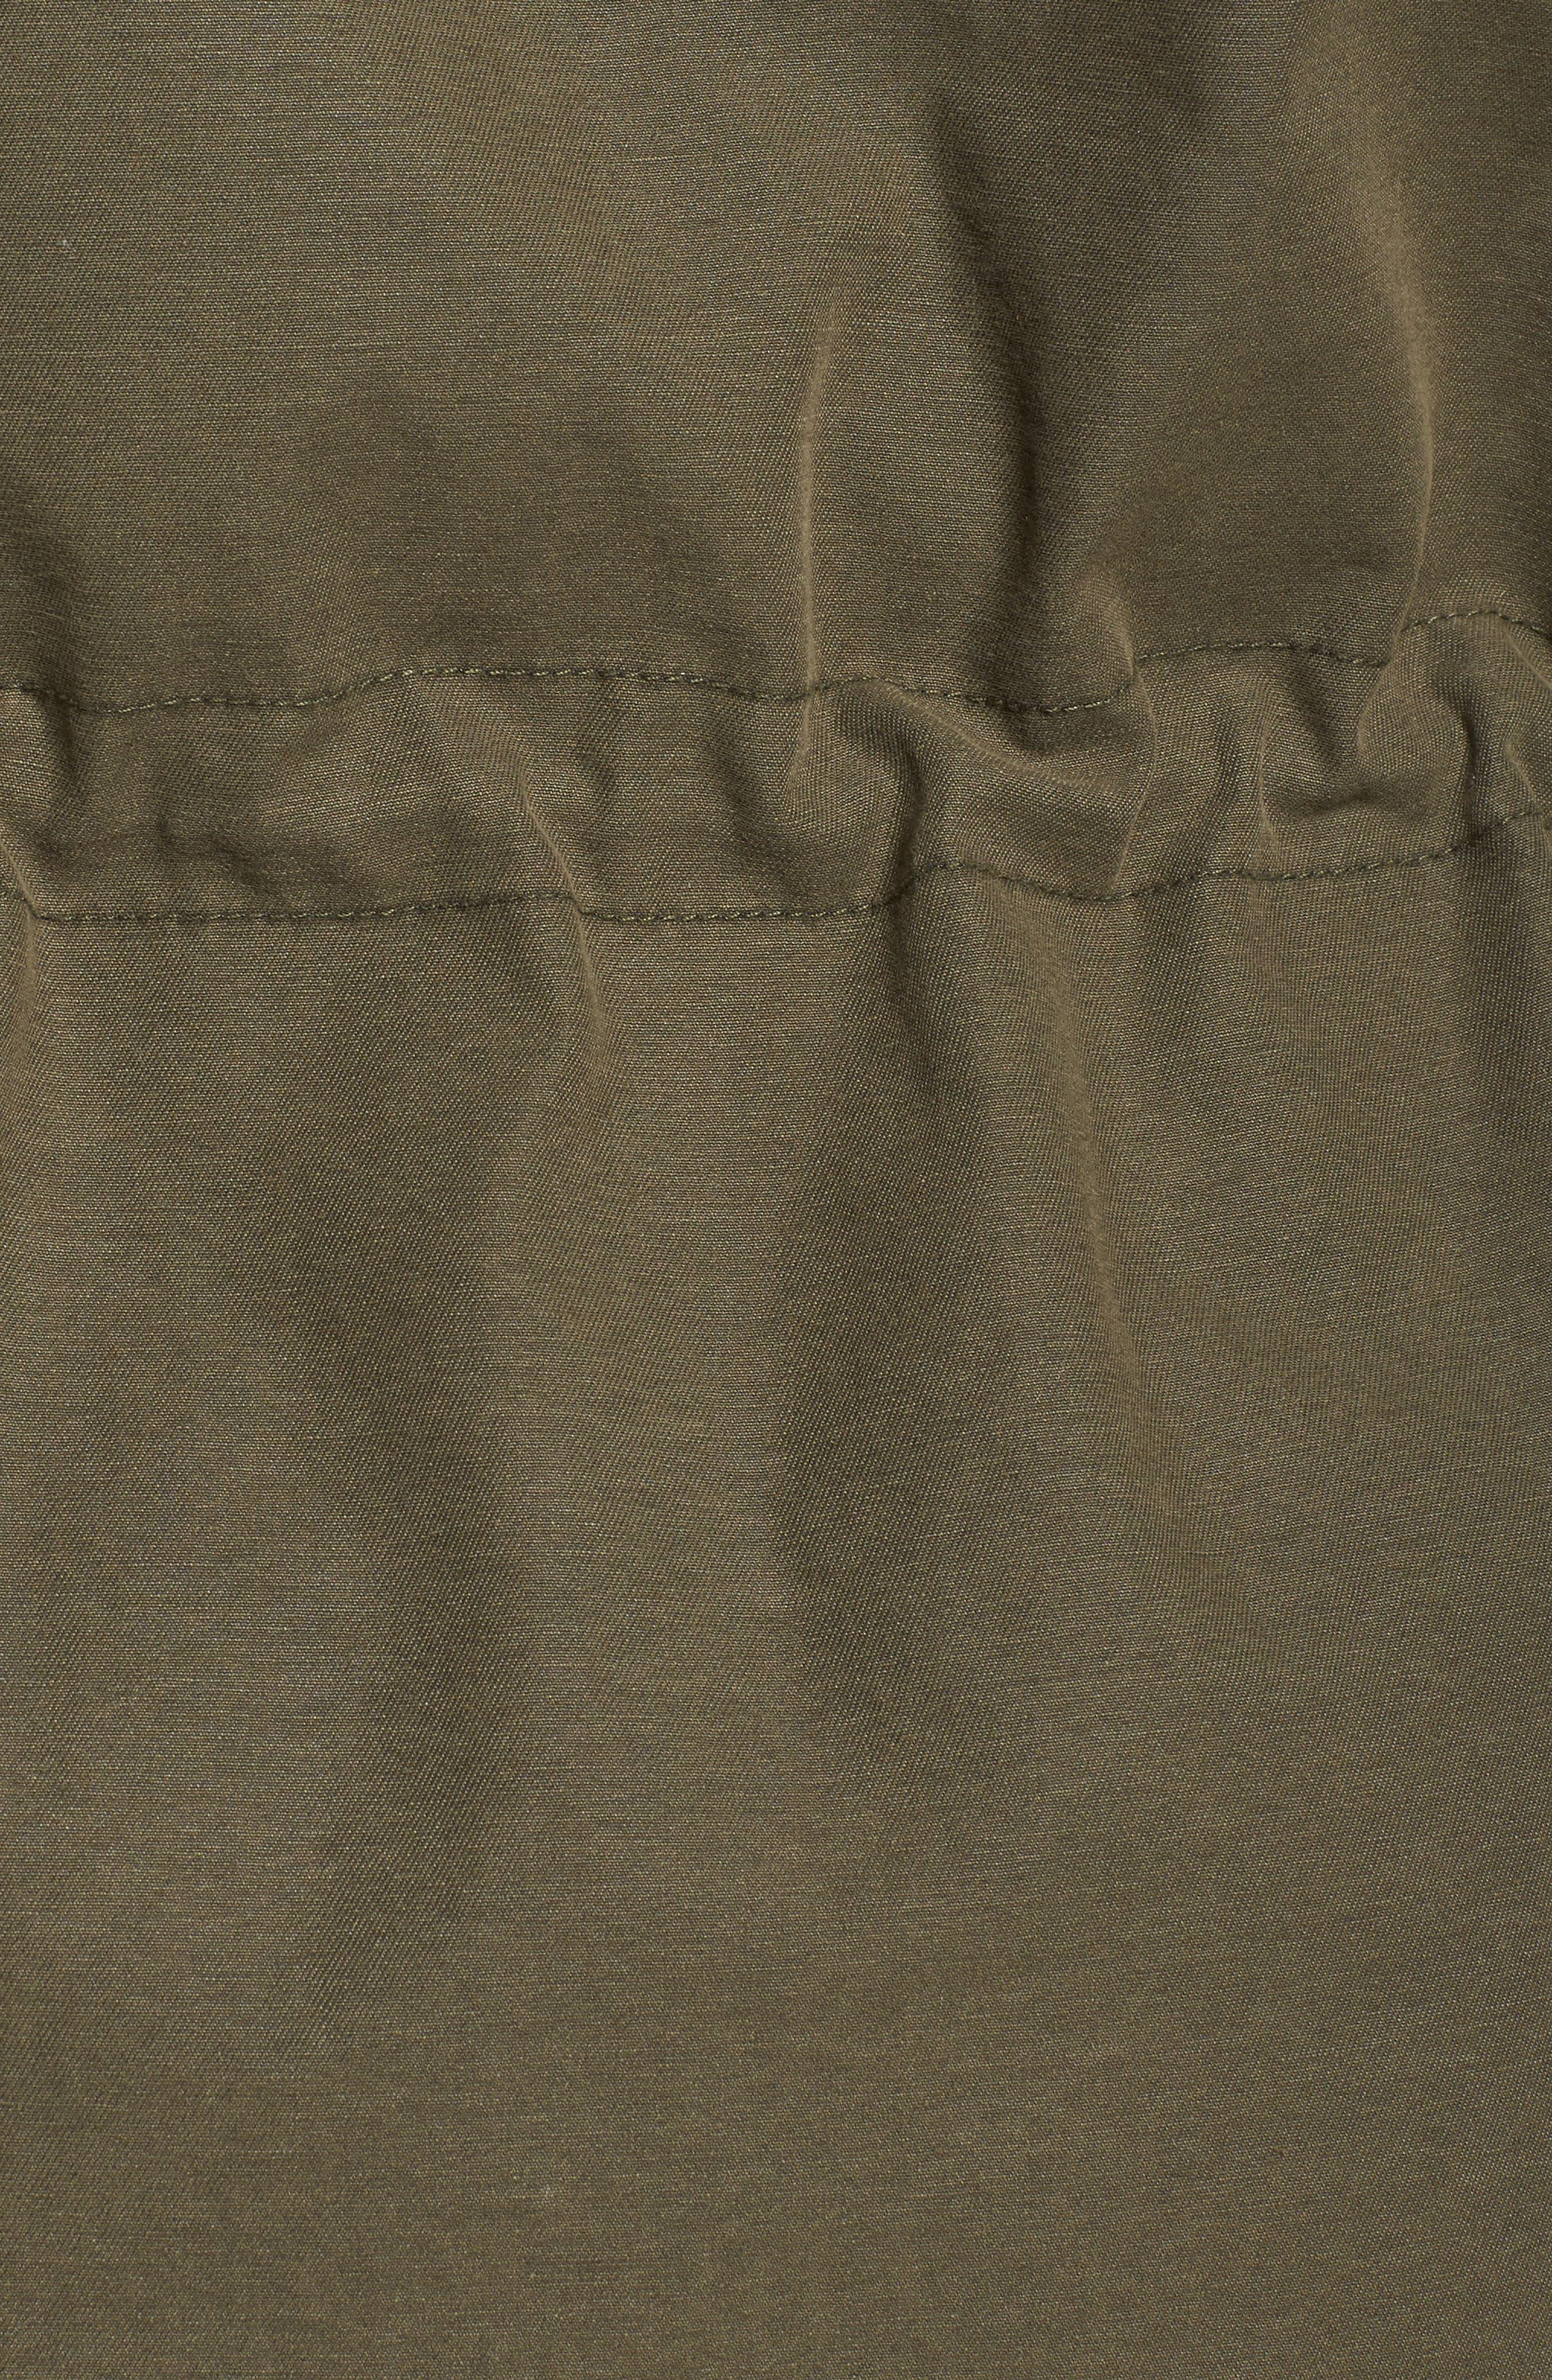 Hooded Cotton Utility Jacket,                             Alternate thumbnail 18, color,